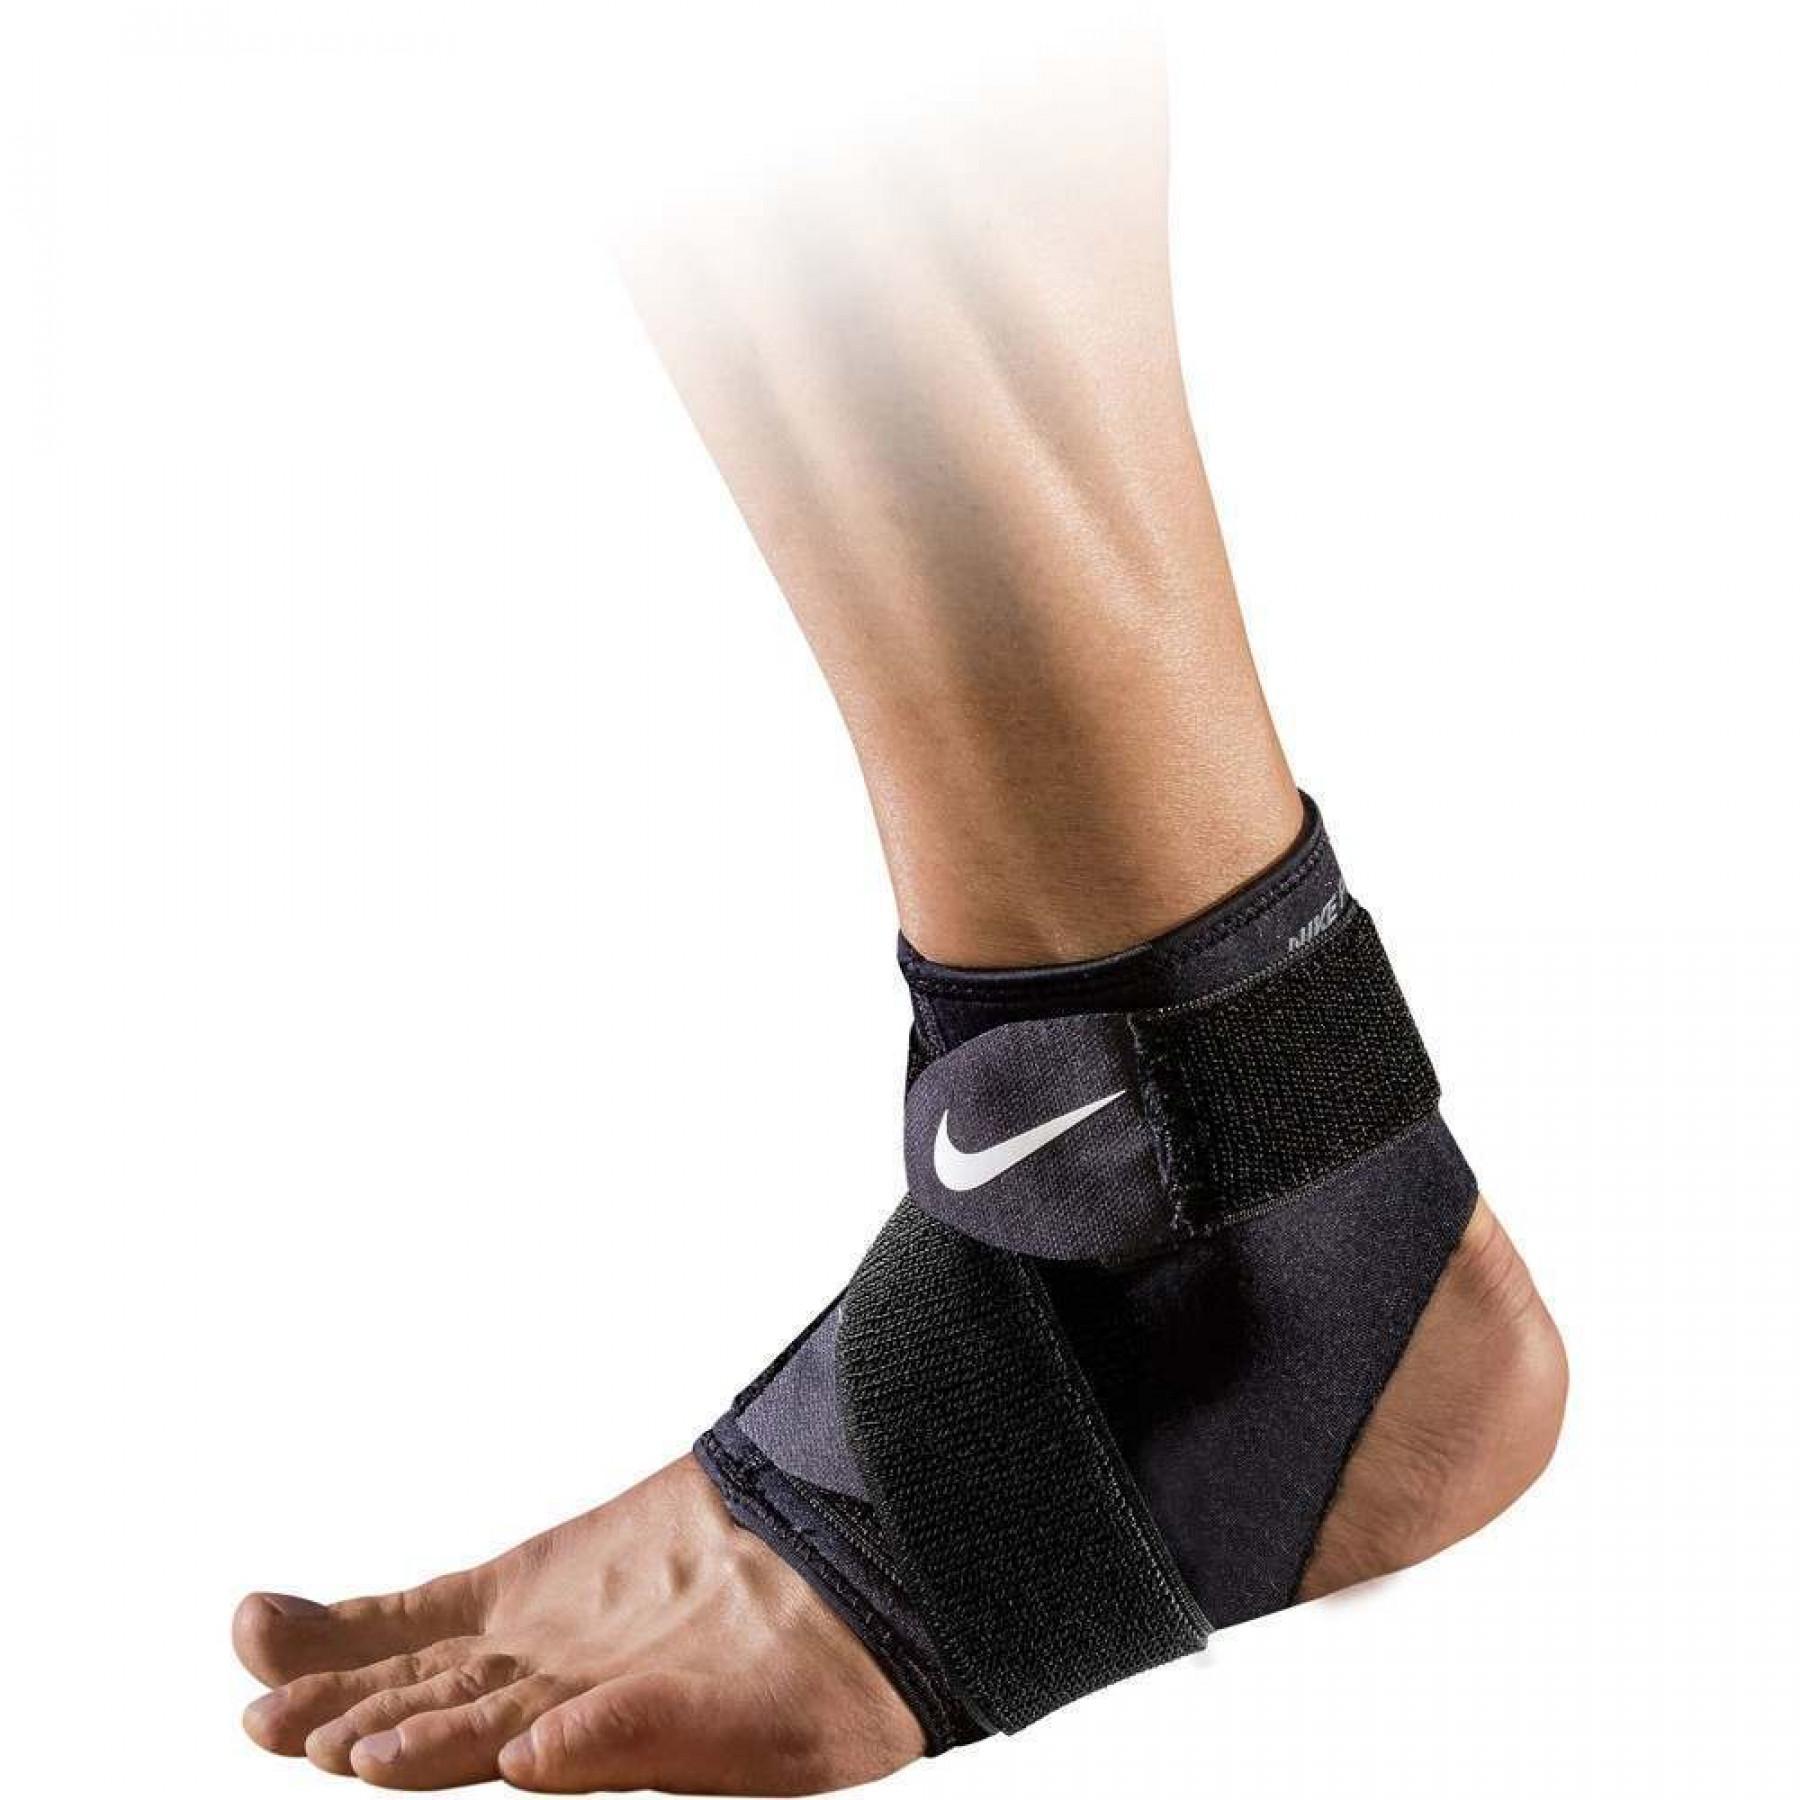 Ankle band Nike pro 2.0